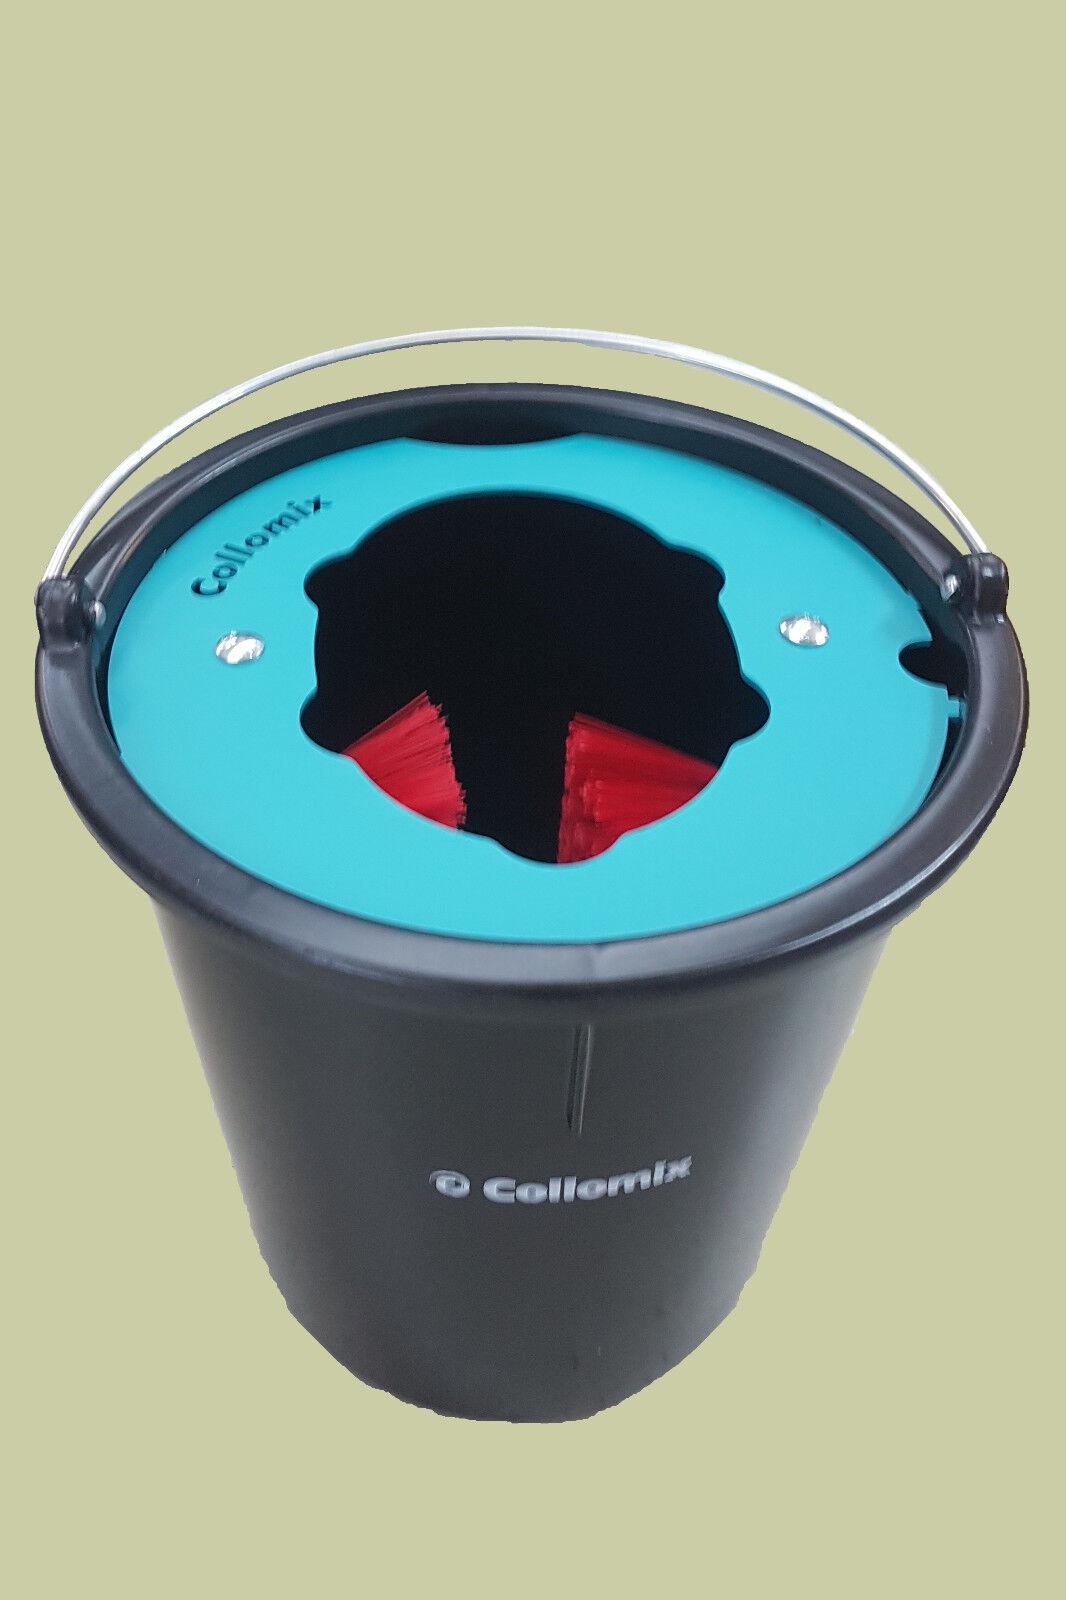 Collomix Mixer-Clean Reinigungseimer Rührwerk Rührquirl für XO1 XO2 XO4 XO6 | Verrückte Preis  | Niedriger Preis  | Outlet Online